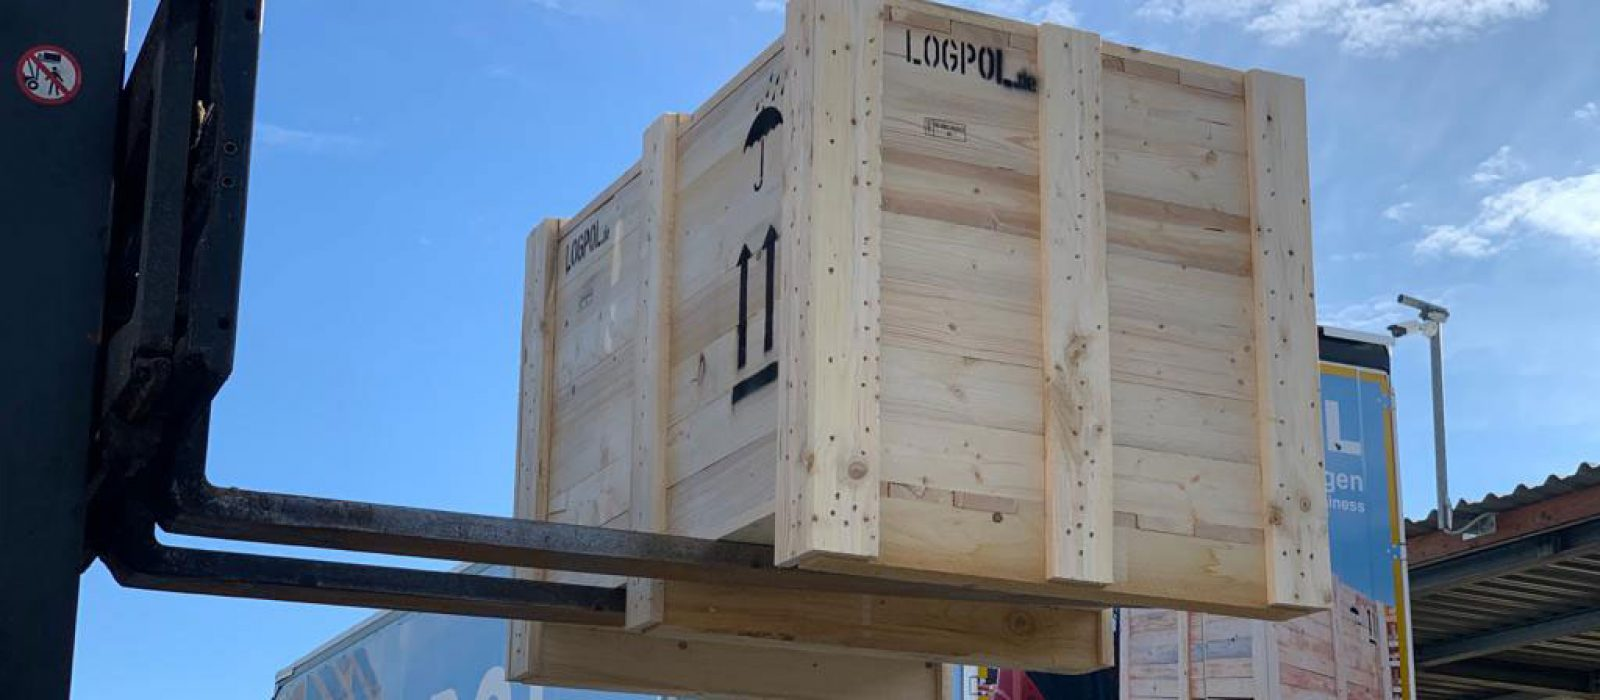 Kiste-1200x800x700-mm-LOGPOL